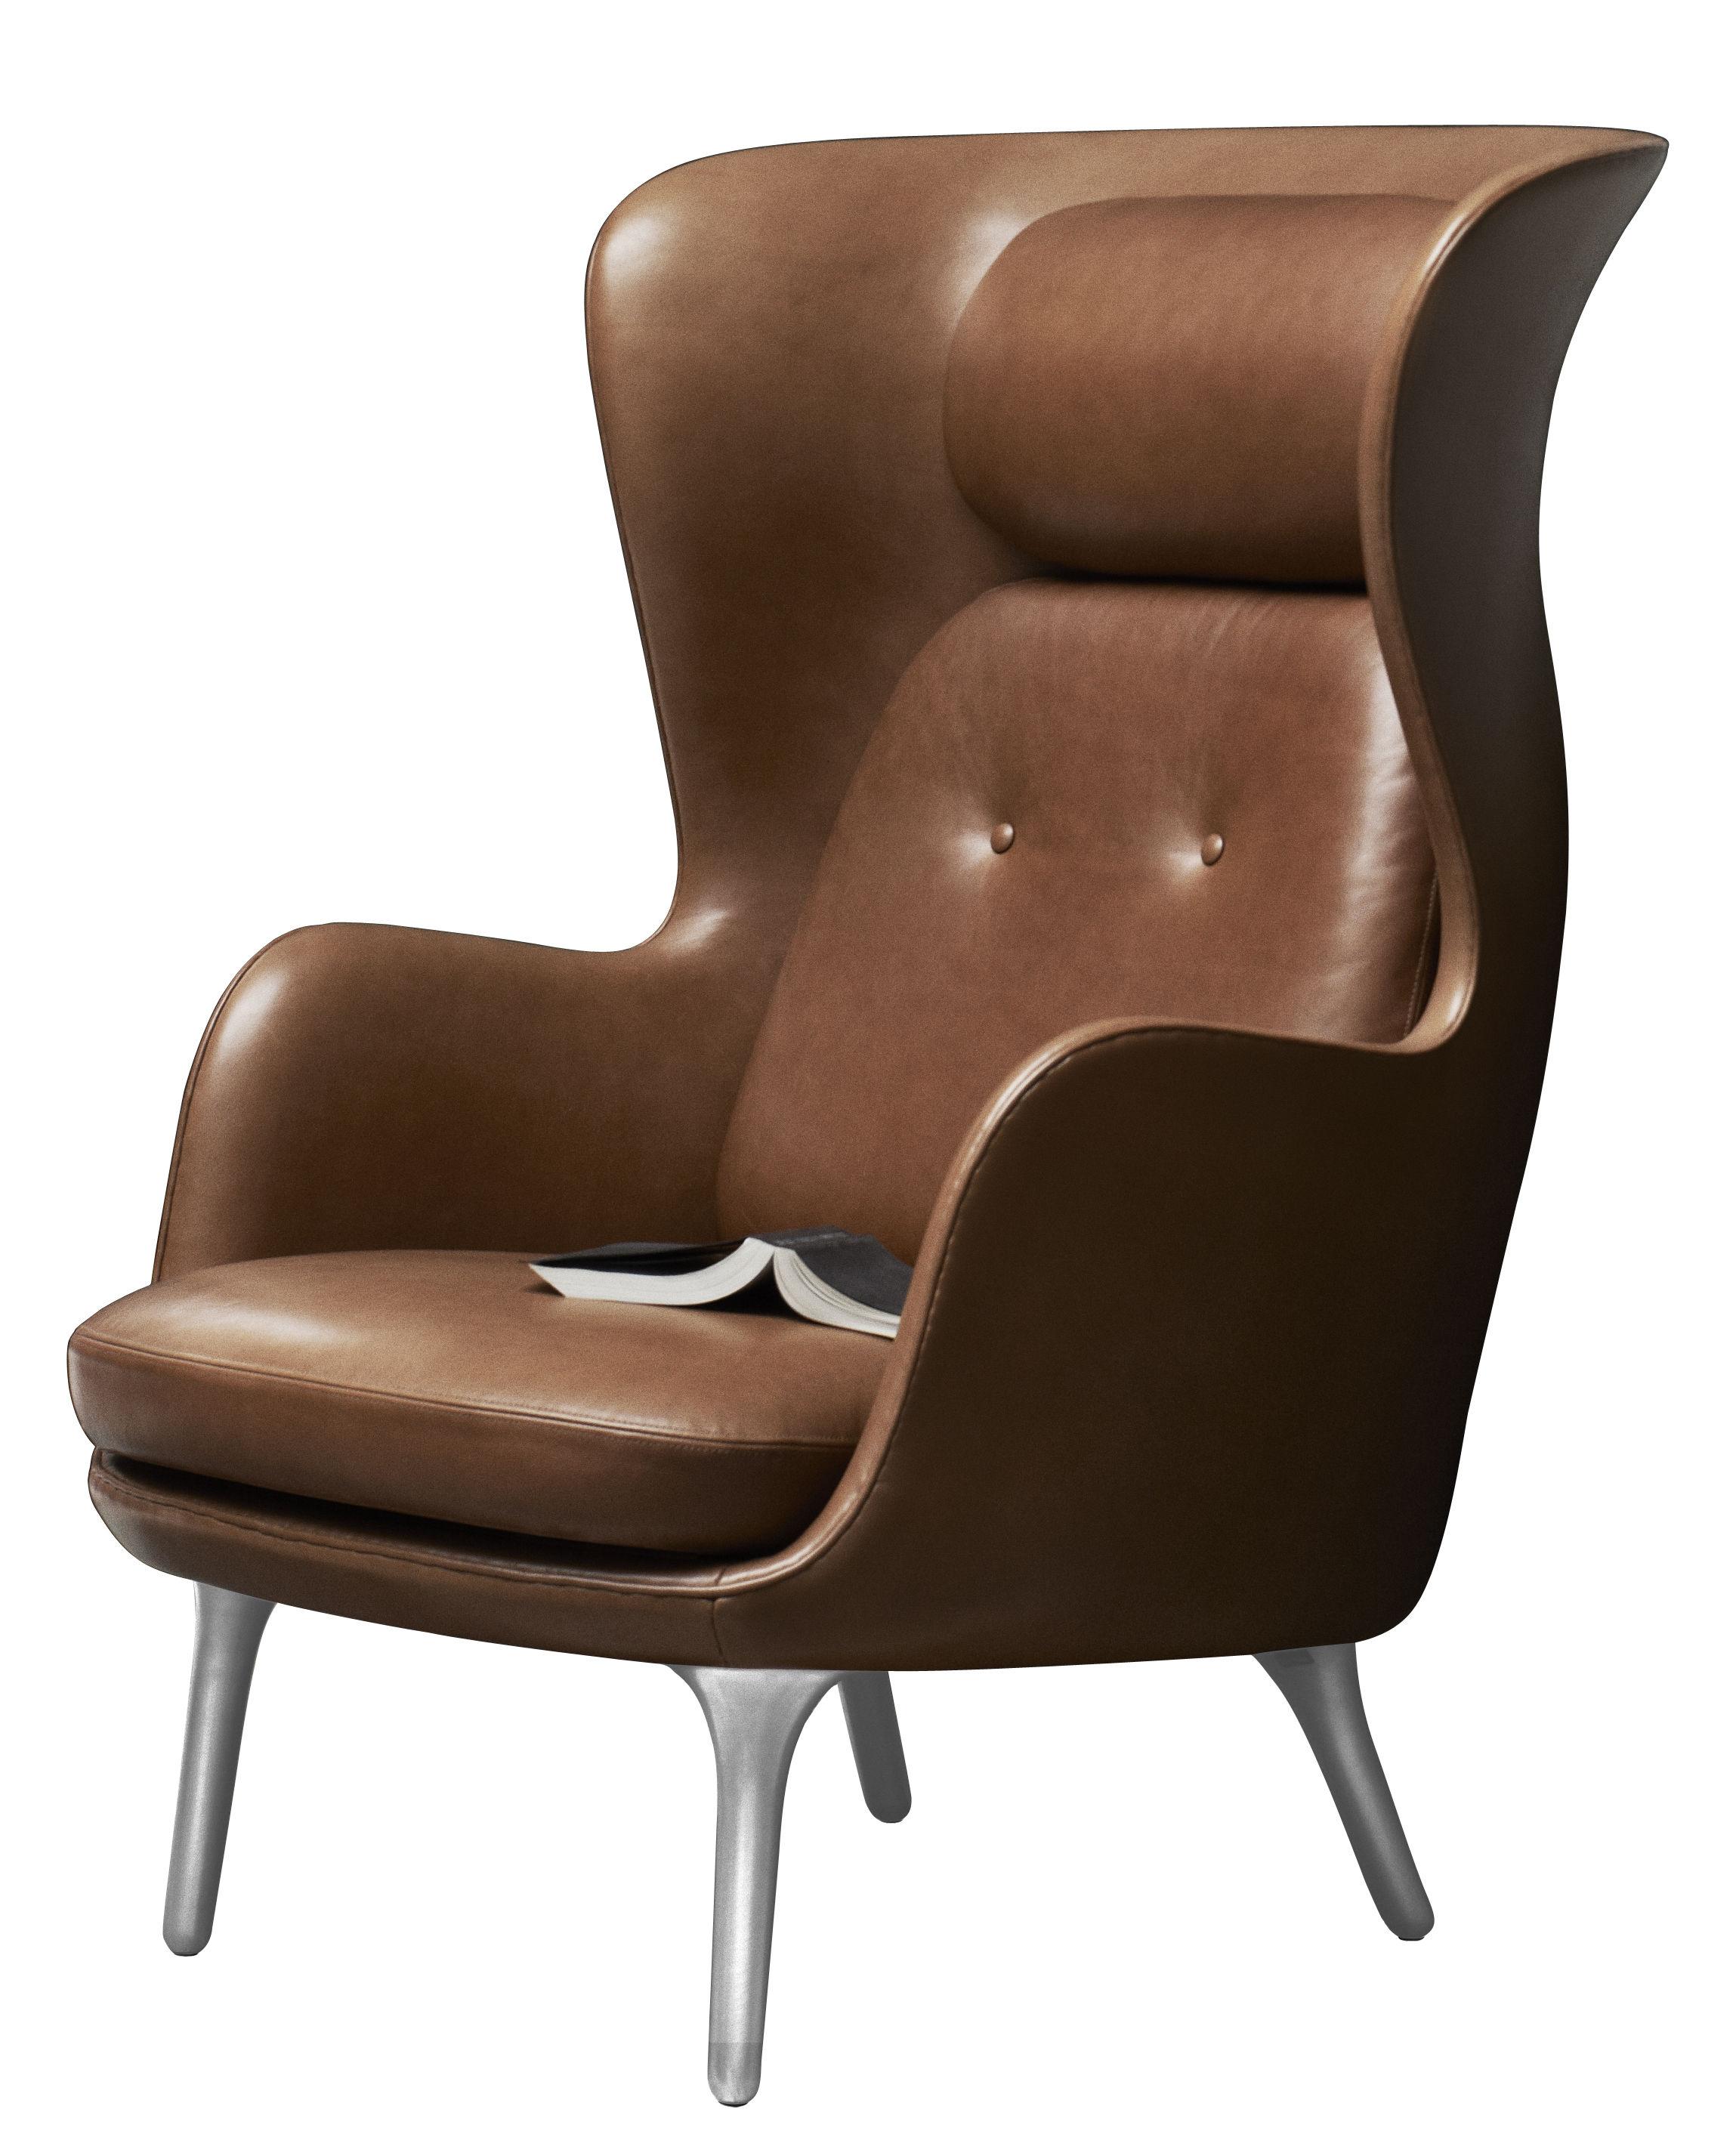 Möbel - Lounge Sessel - Ro Gepolsterter Sessel / Leder - Fritz Hansen - Braunes Leder - Cuir véritable, gebürstetes Aluminium, Polyurethan-Schaum, Polyurhethan